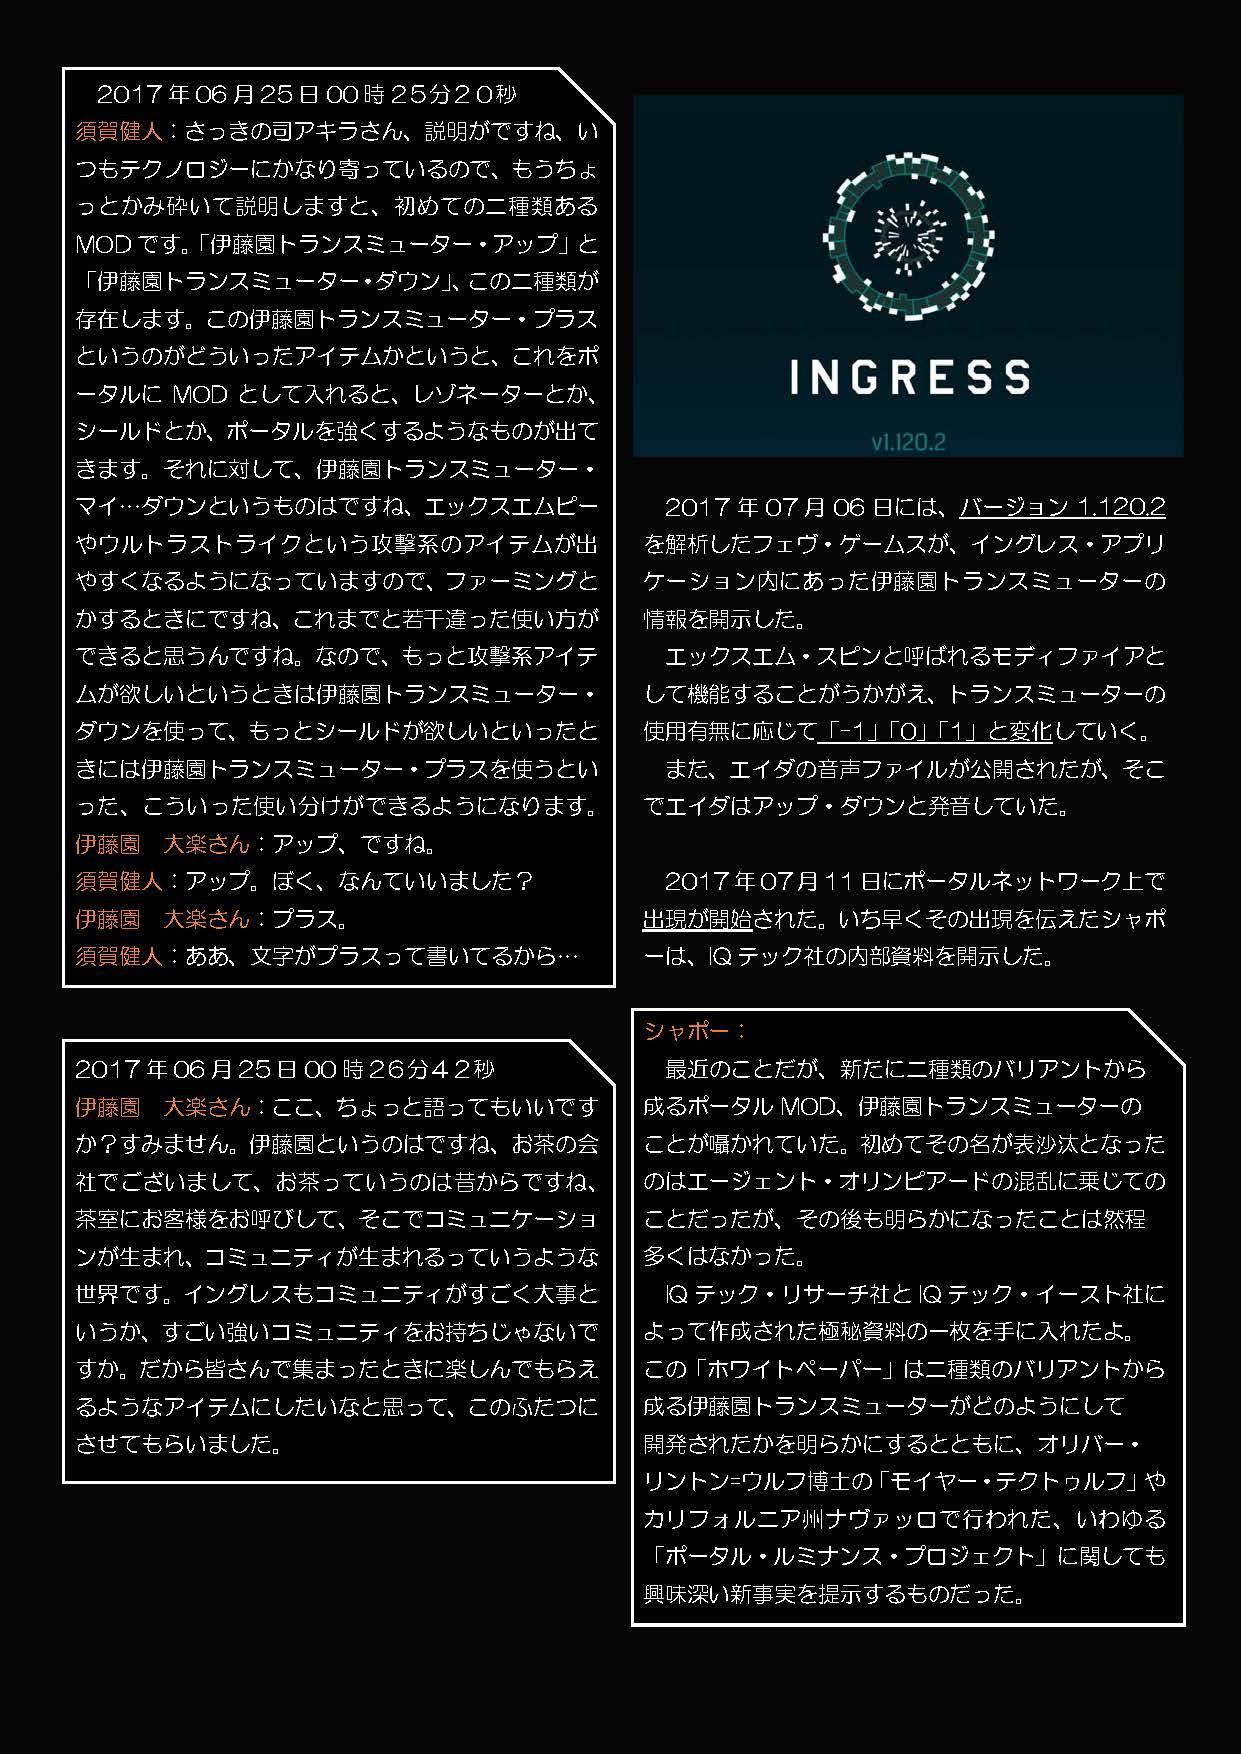 http://ingress.lycaeum.net/2017/07/c2de3a2a5648890ee285b4a1ad2b7e9f29679ede.jpg